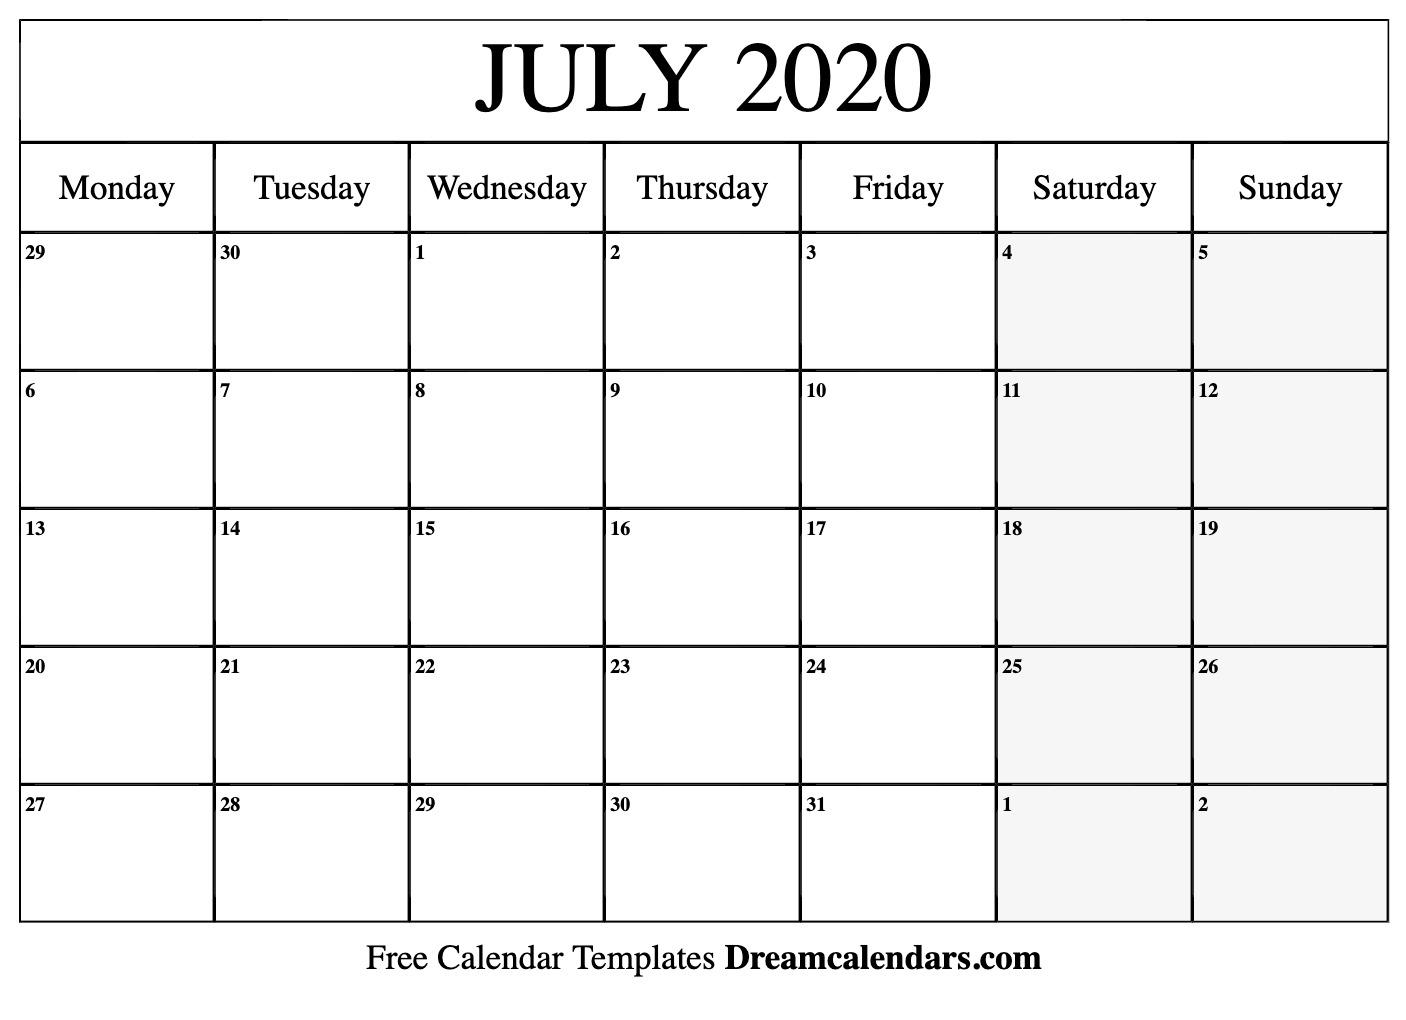 Printable July 2020 Calendar - Ko-Fi ❤️ Where Creators Get